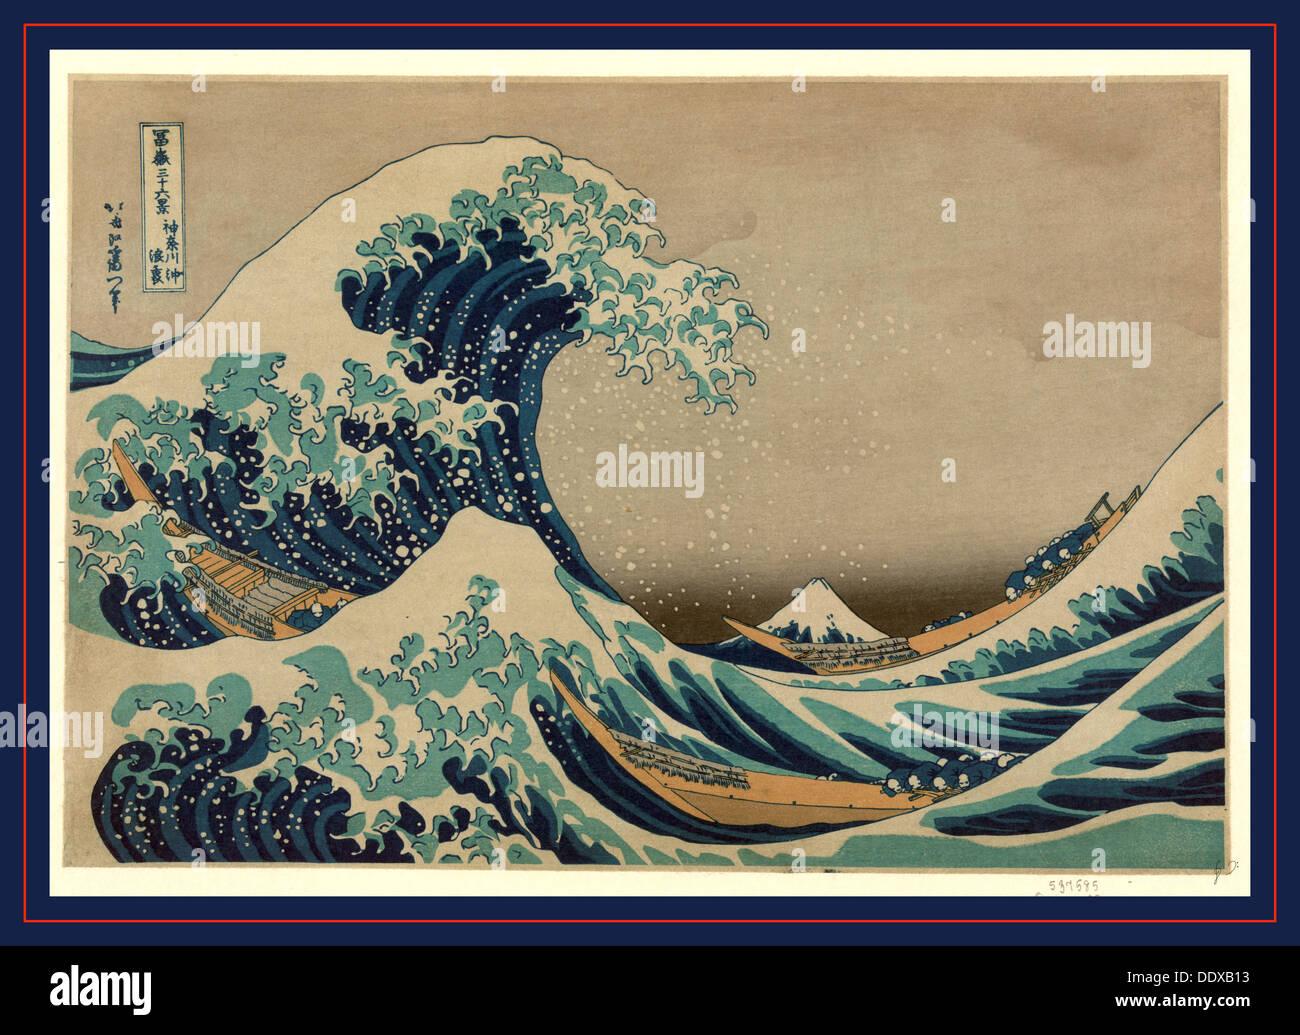 Kanagawa oki nami ura, la grande vague de Kanagawa off shore. [Entre 1826 et 1833, imprimé plus tard], 1 tirage: Banque D'Images